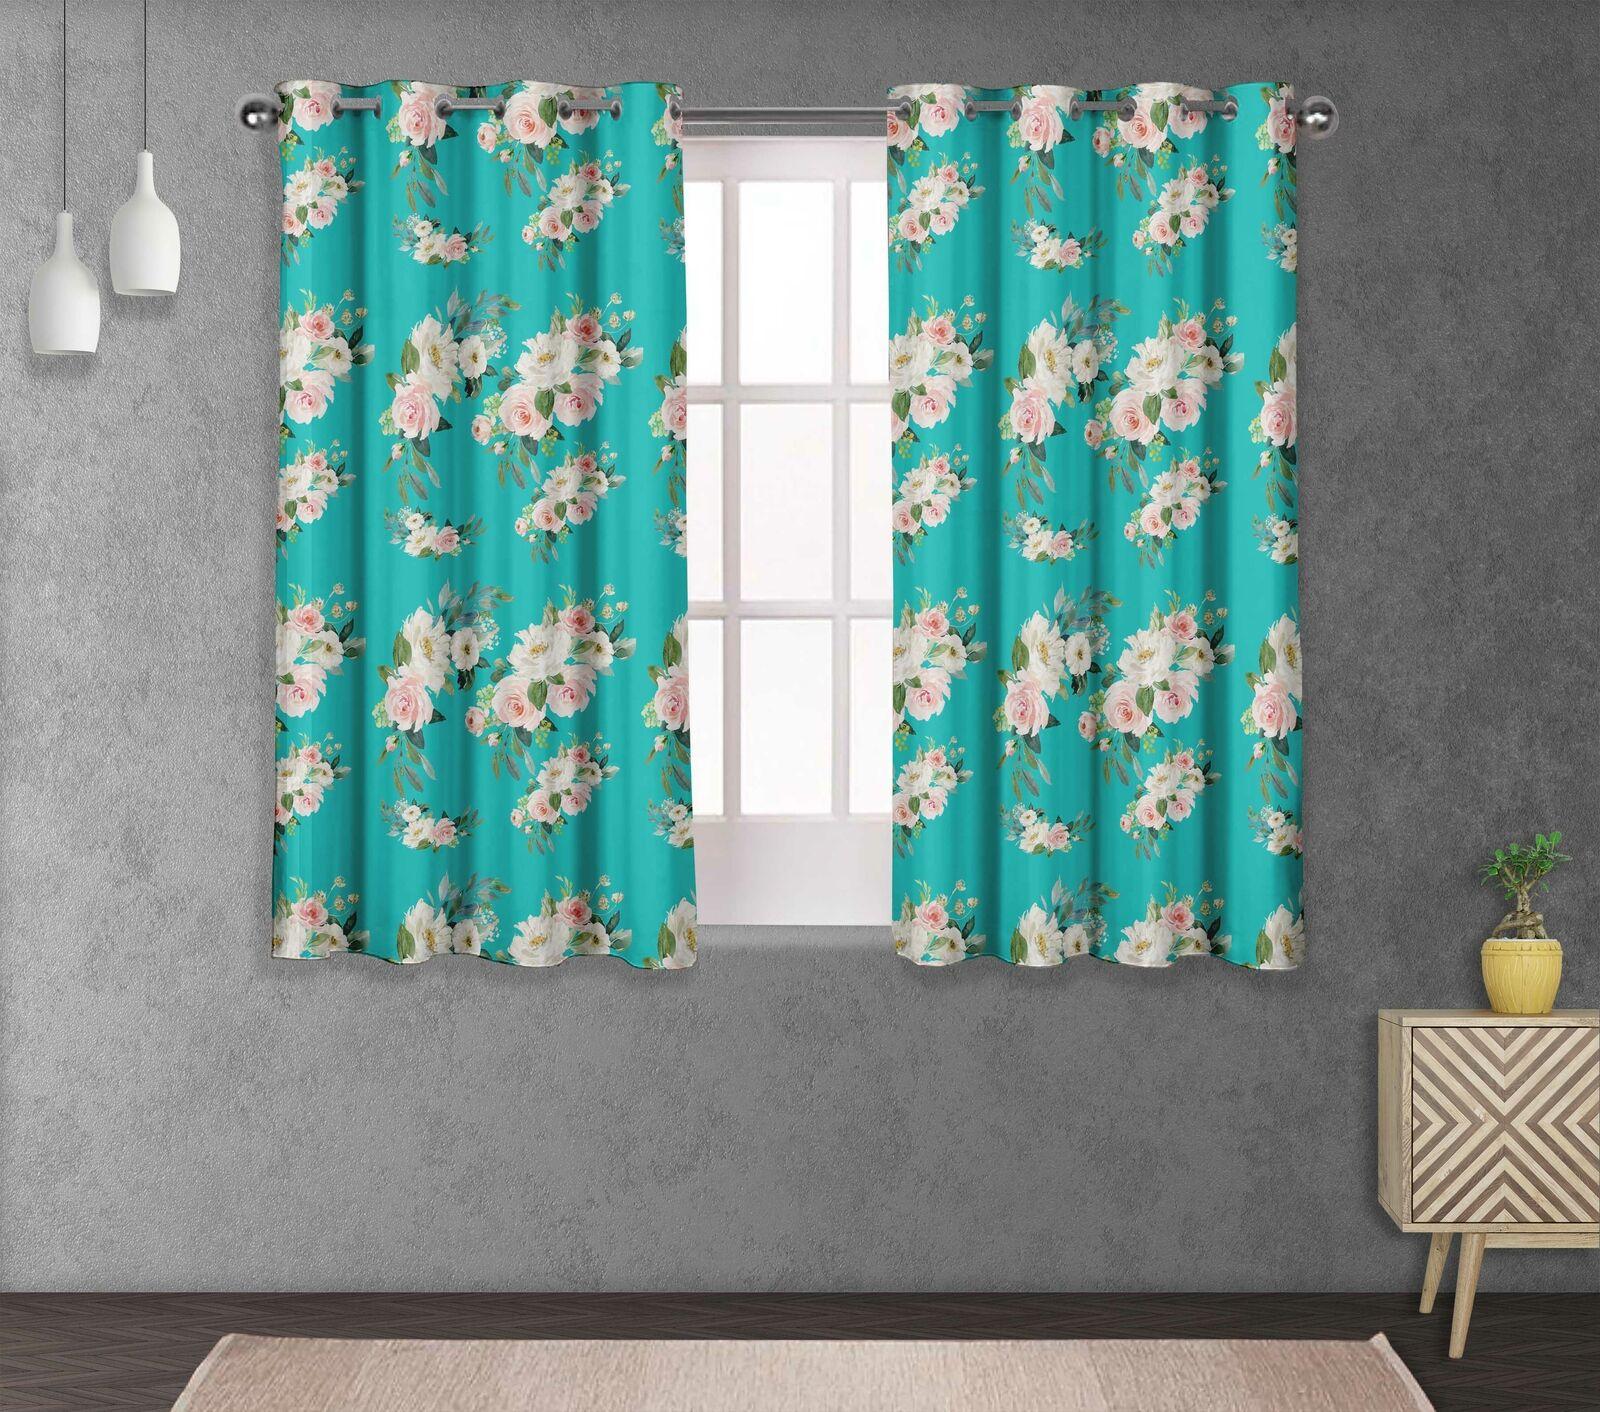 S4sassy Leaves & Ranunculus Living Room Eyelet Curtain Drapers -FL-706C